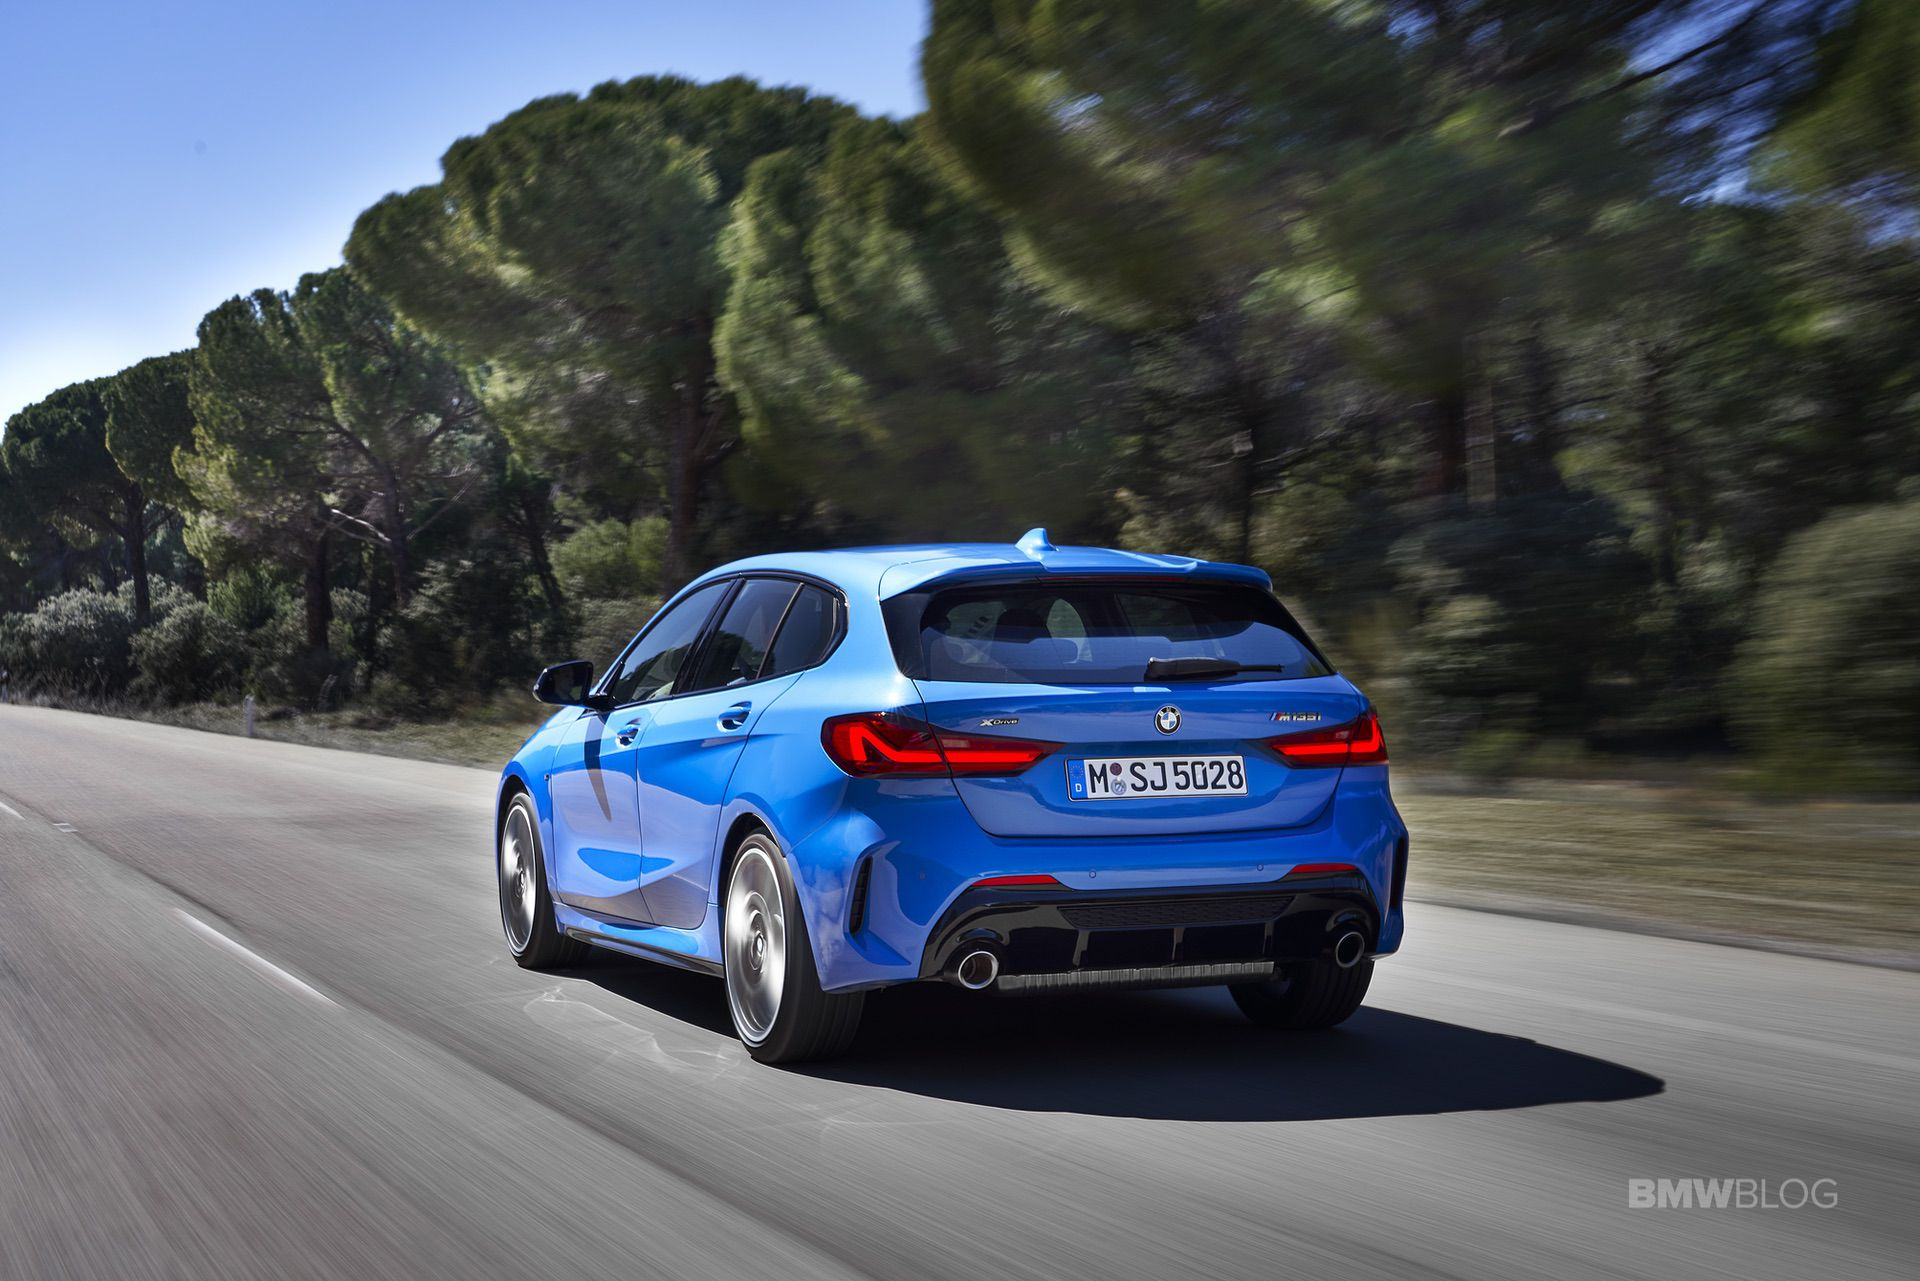 2020-BMW-M135i-xDrive-Misano-Blue-05.jpg